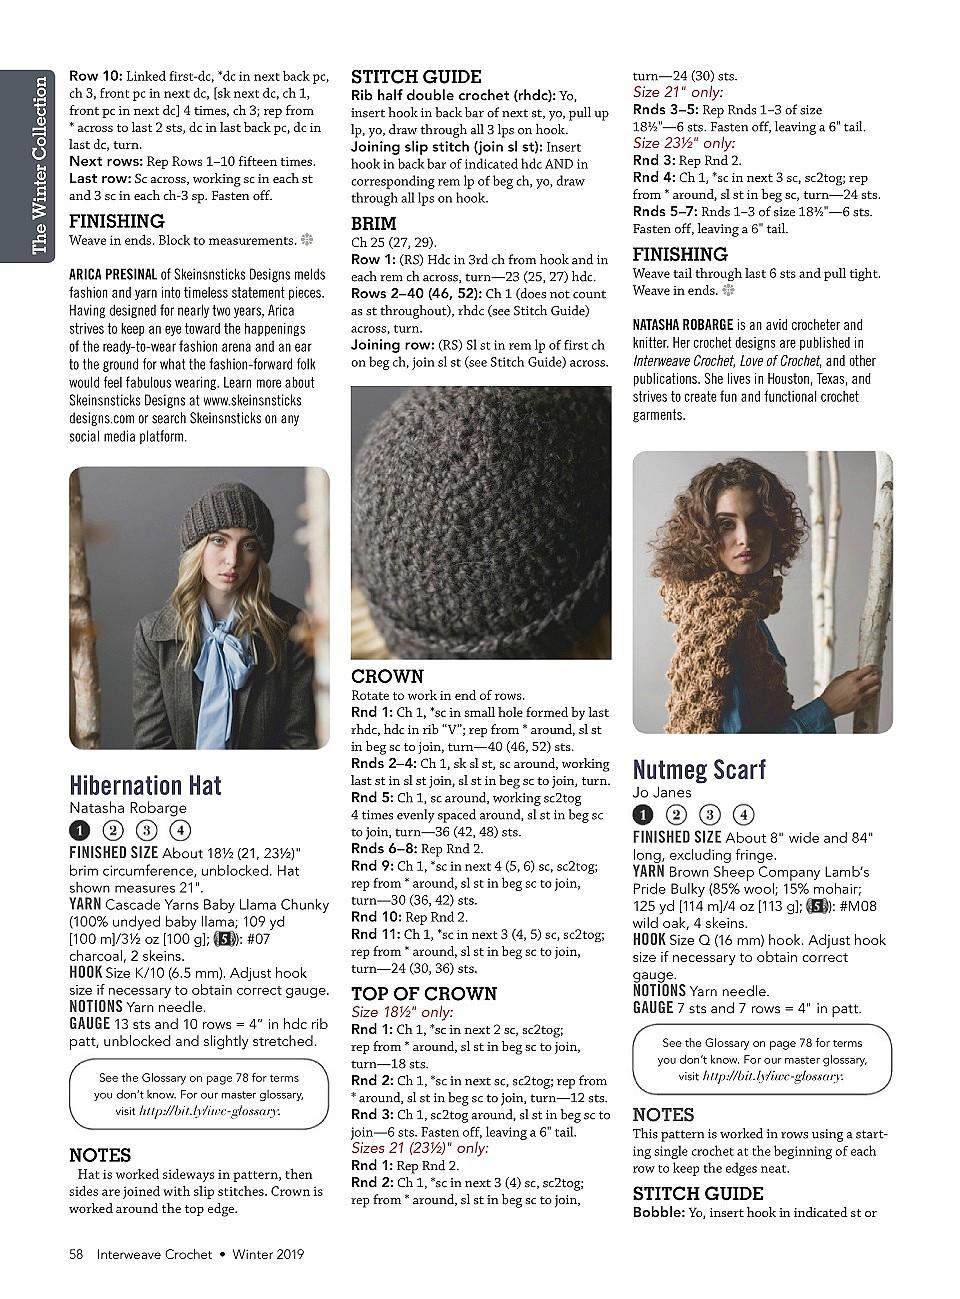 Interweave Crochet Winter 2019-59